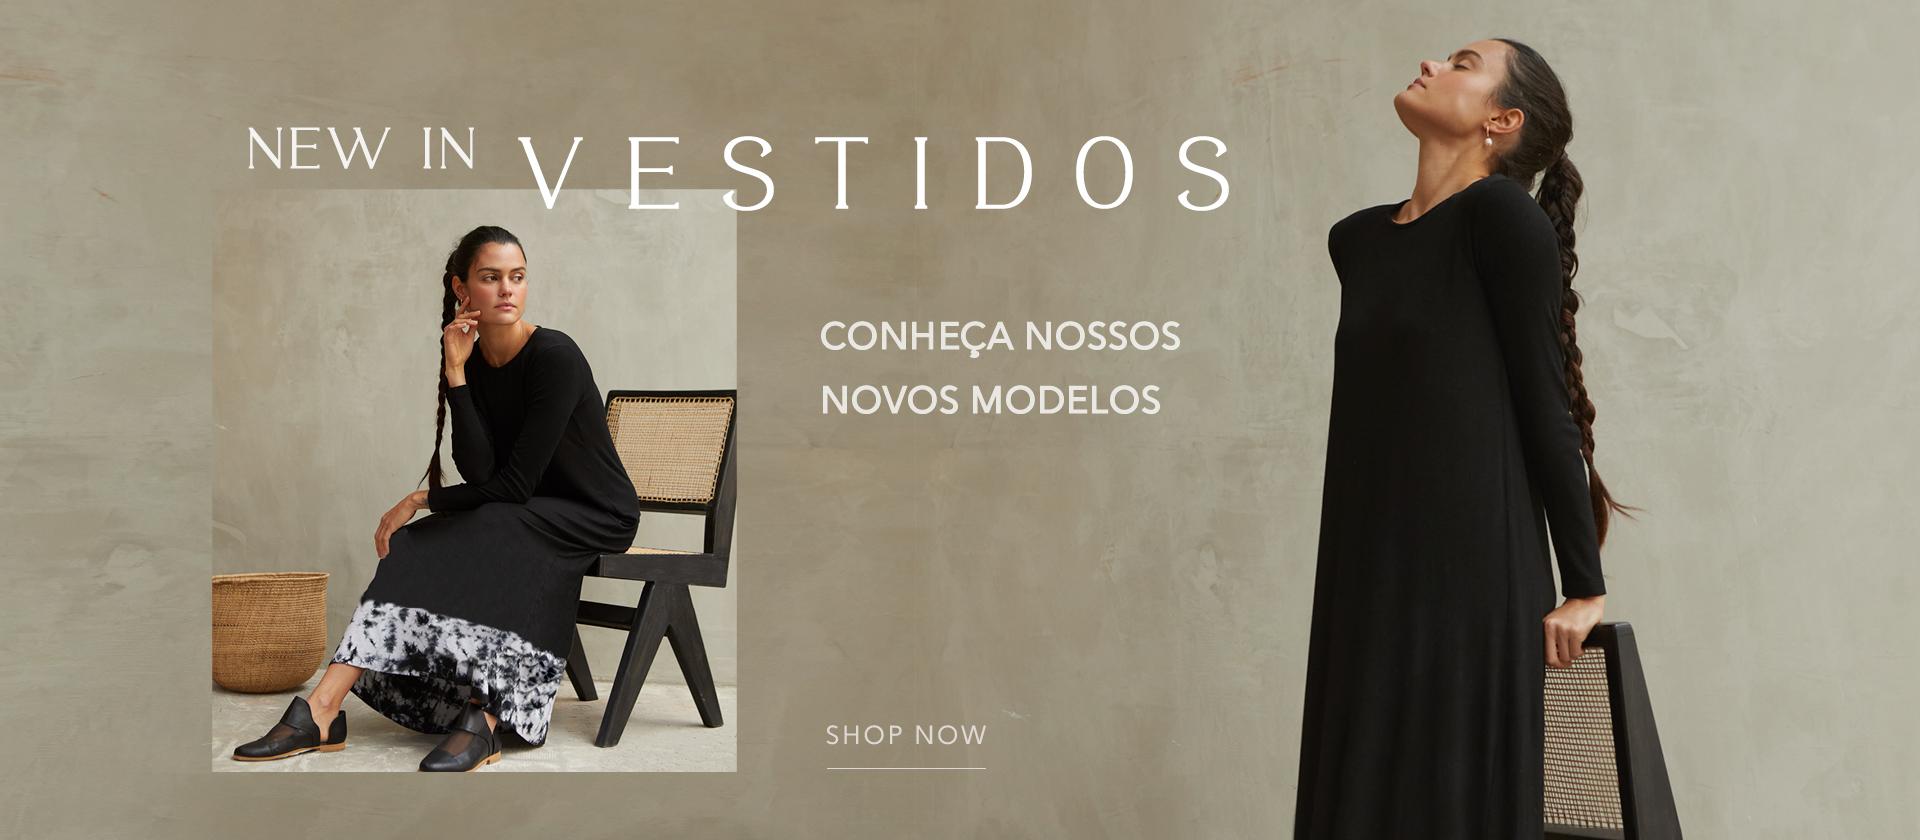 Desktop - 18/06 - Vestidos